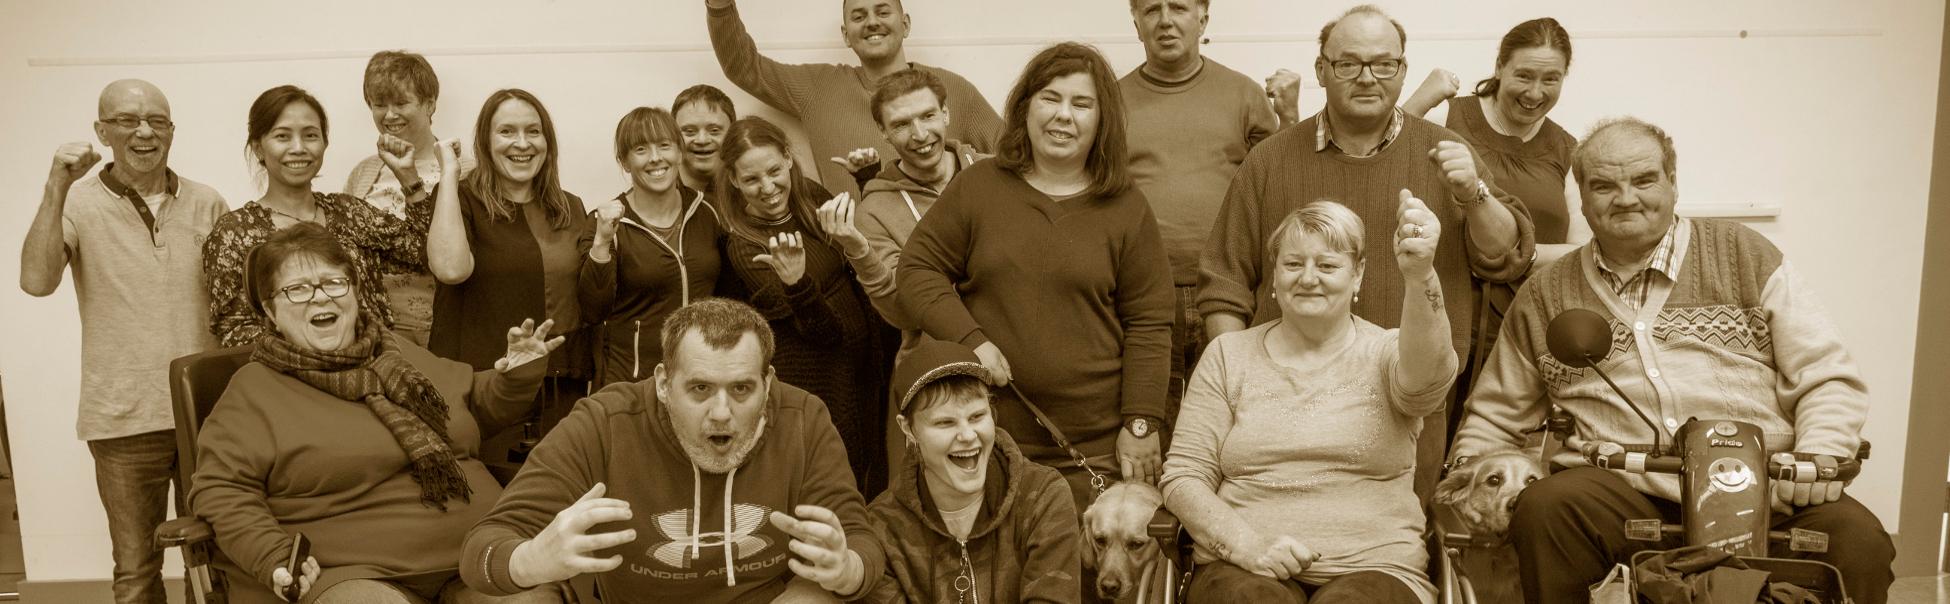 group photograph